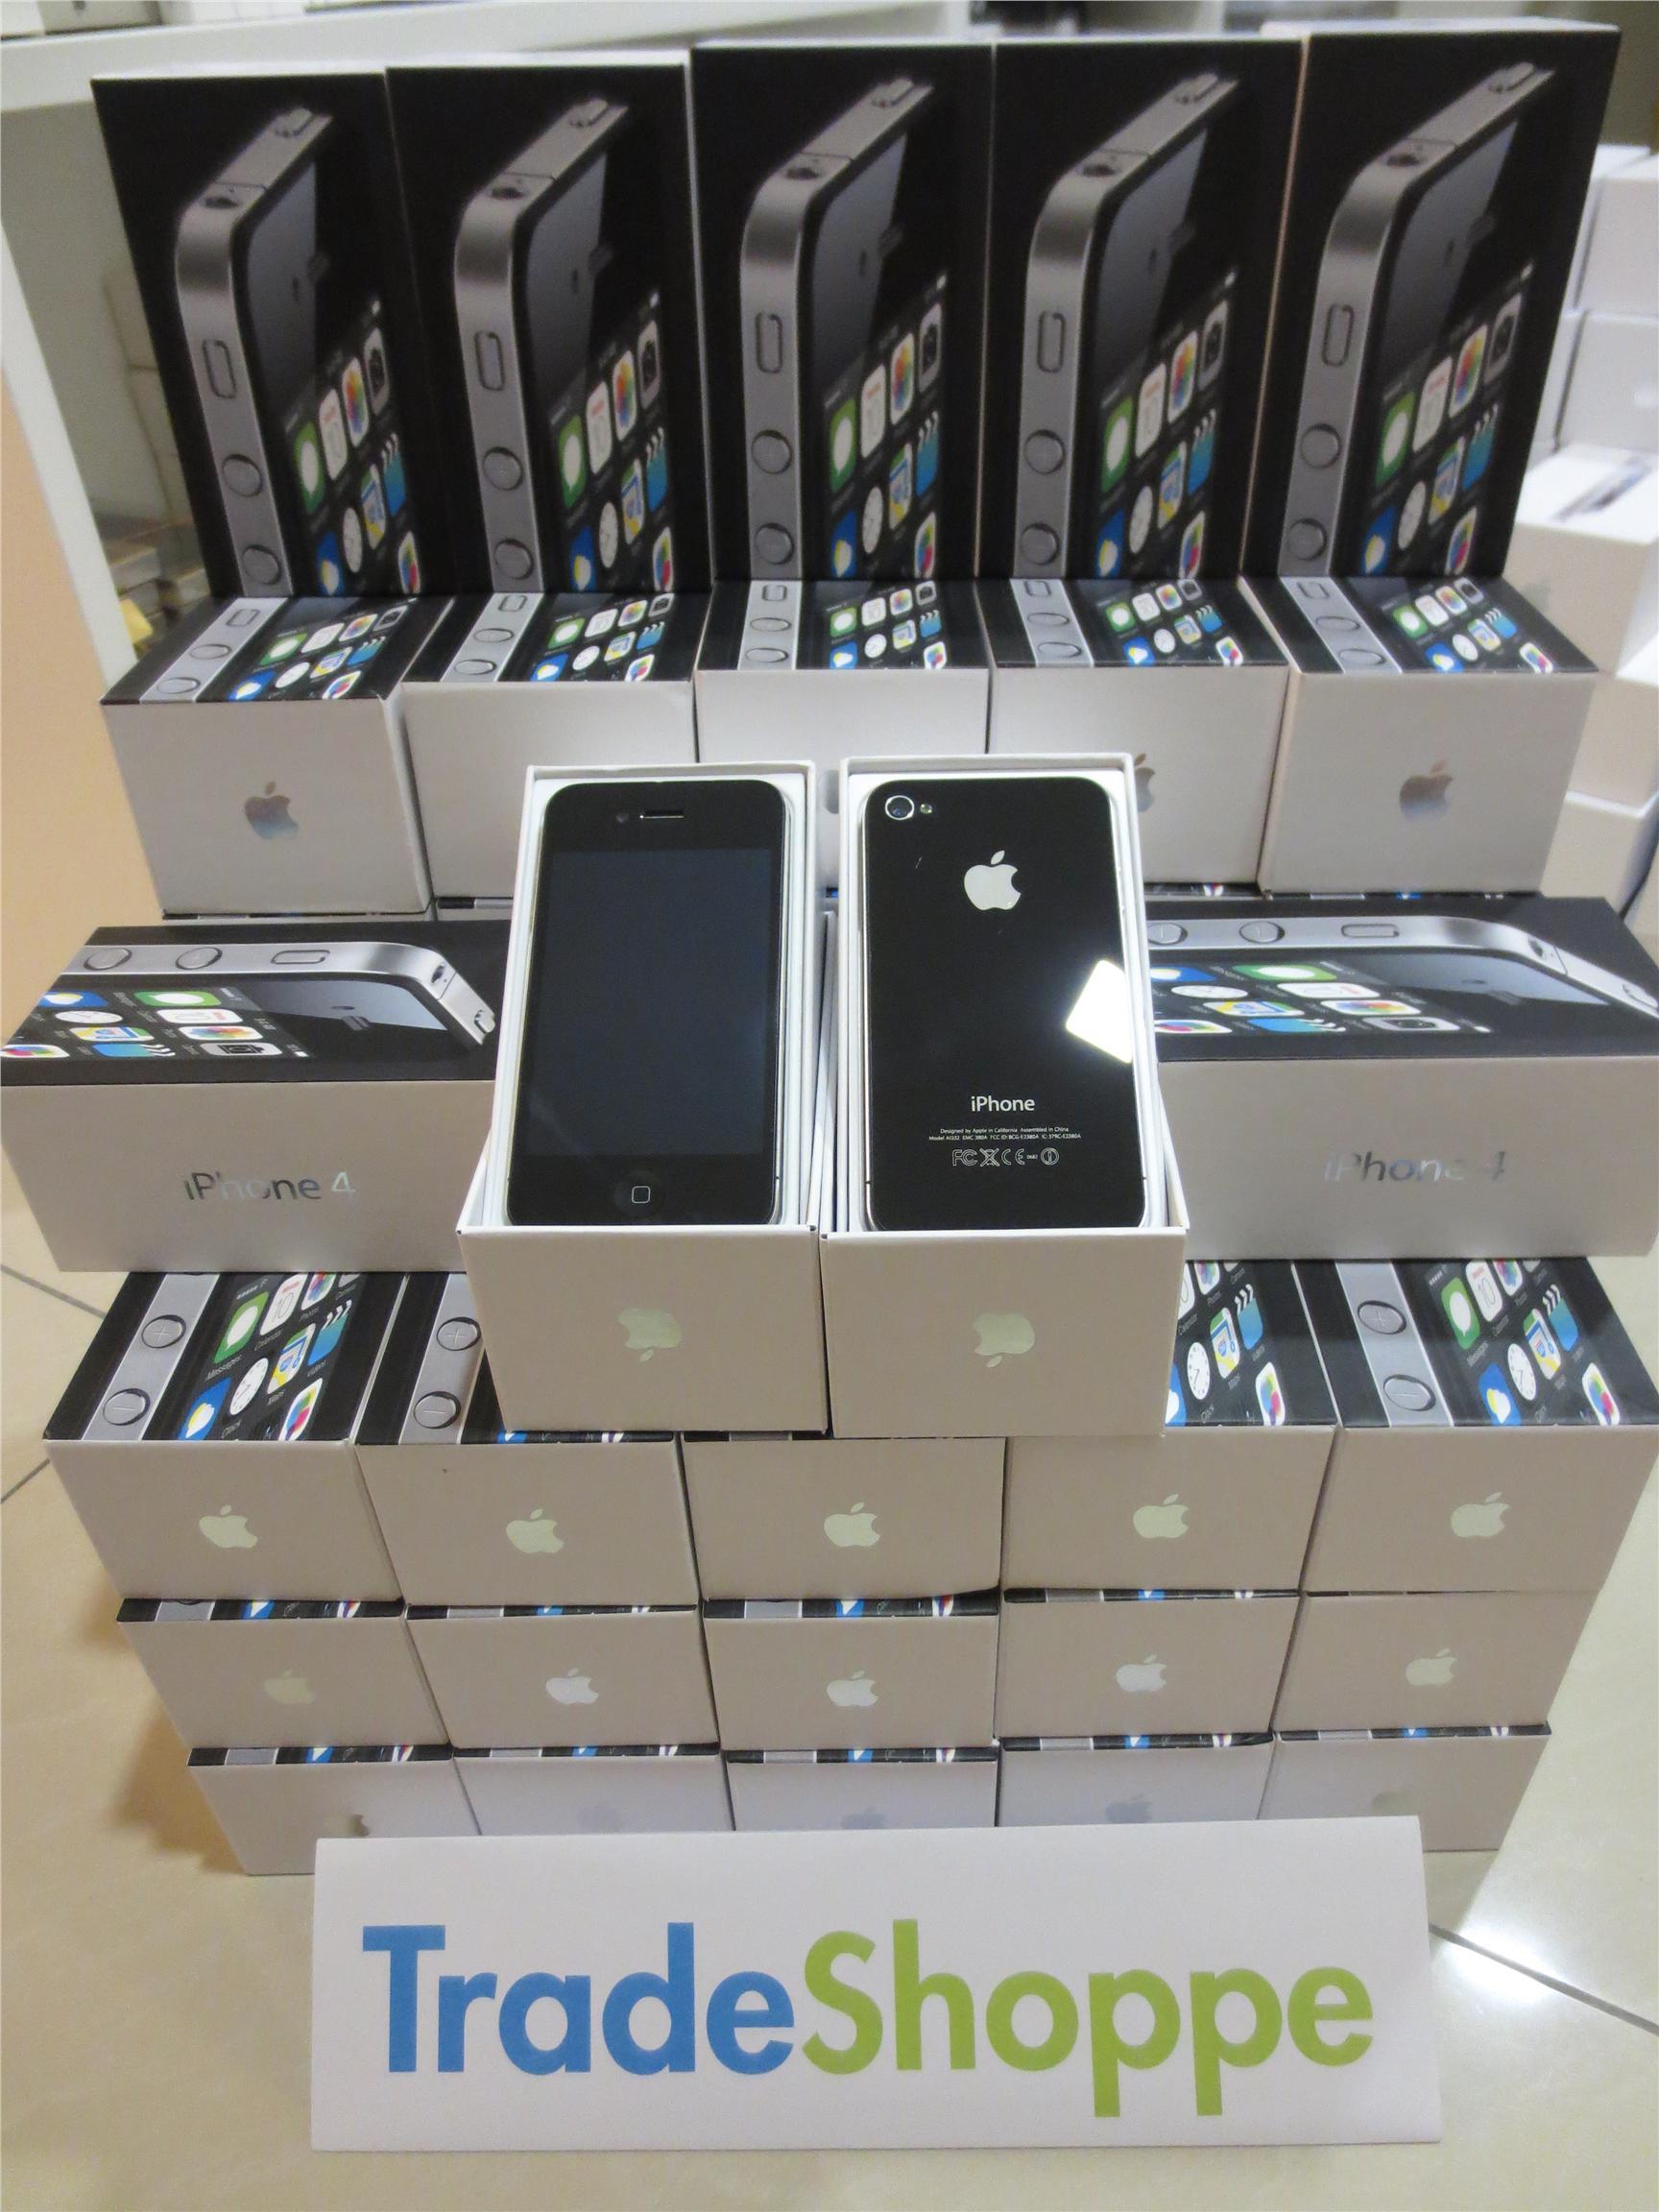 Apple Iphone 4 8gb 16gb 32gb Used G End 3 5 2019 115 Am Oppo Find 7a Ram 2gb Putih Good Conditon Original